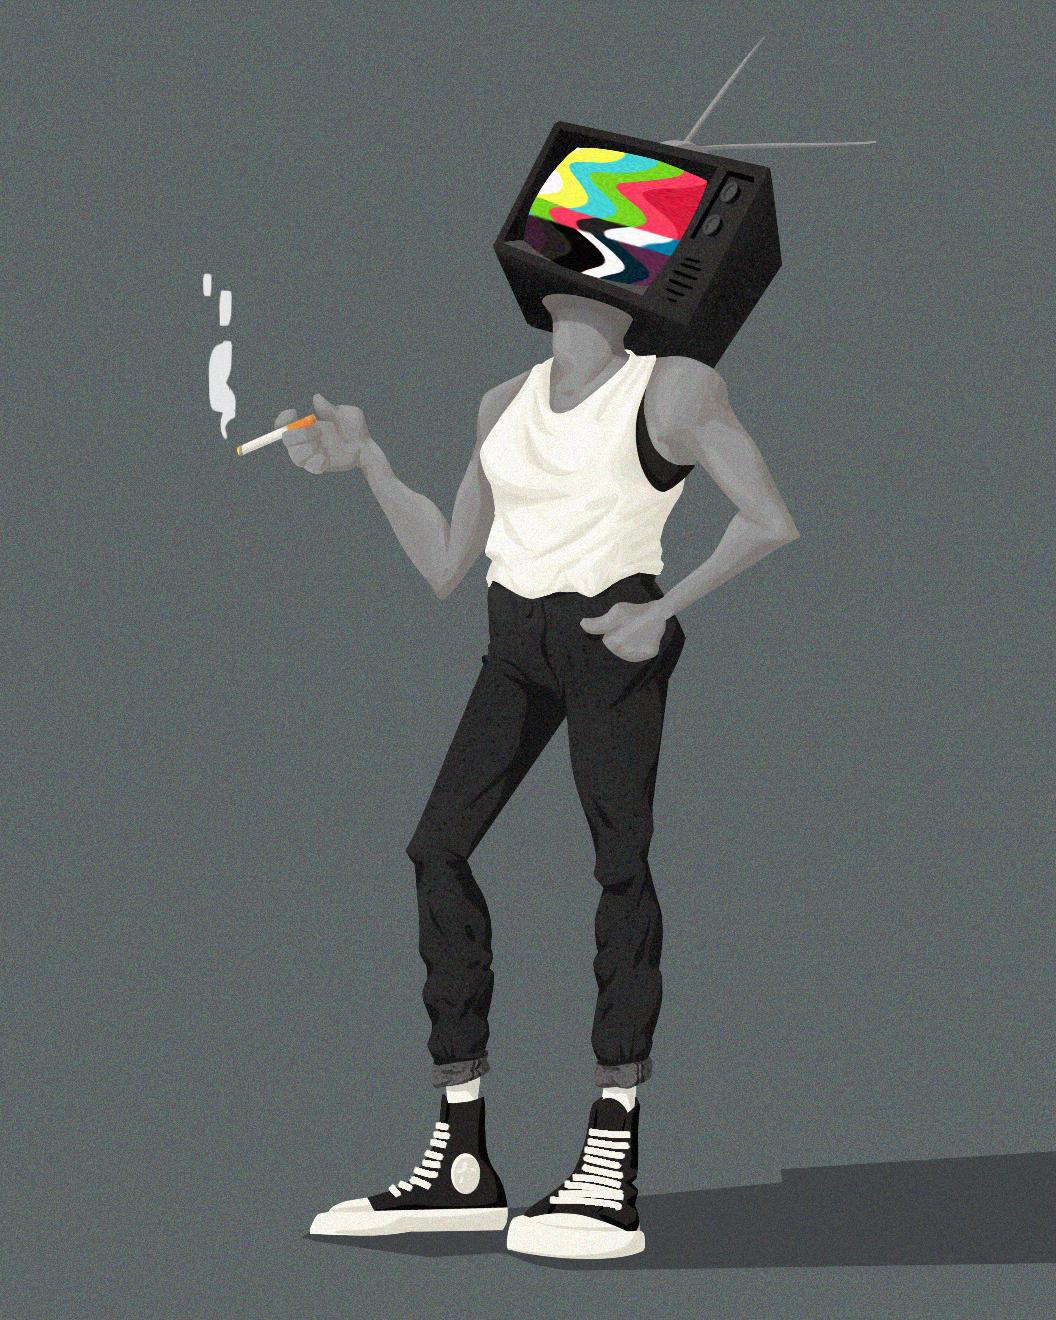 TV_mood-zigzag_